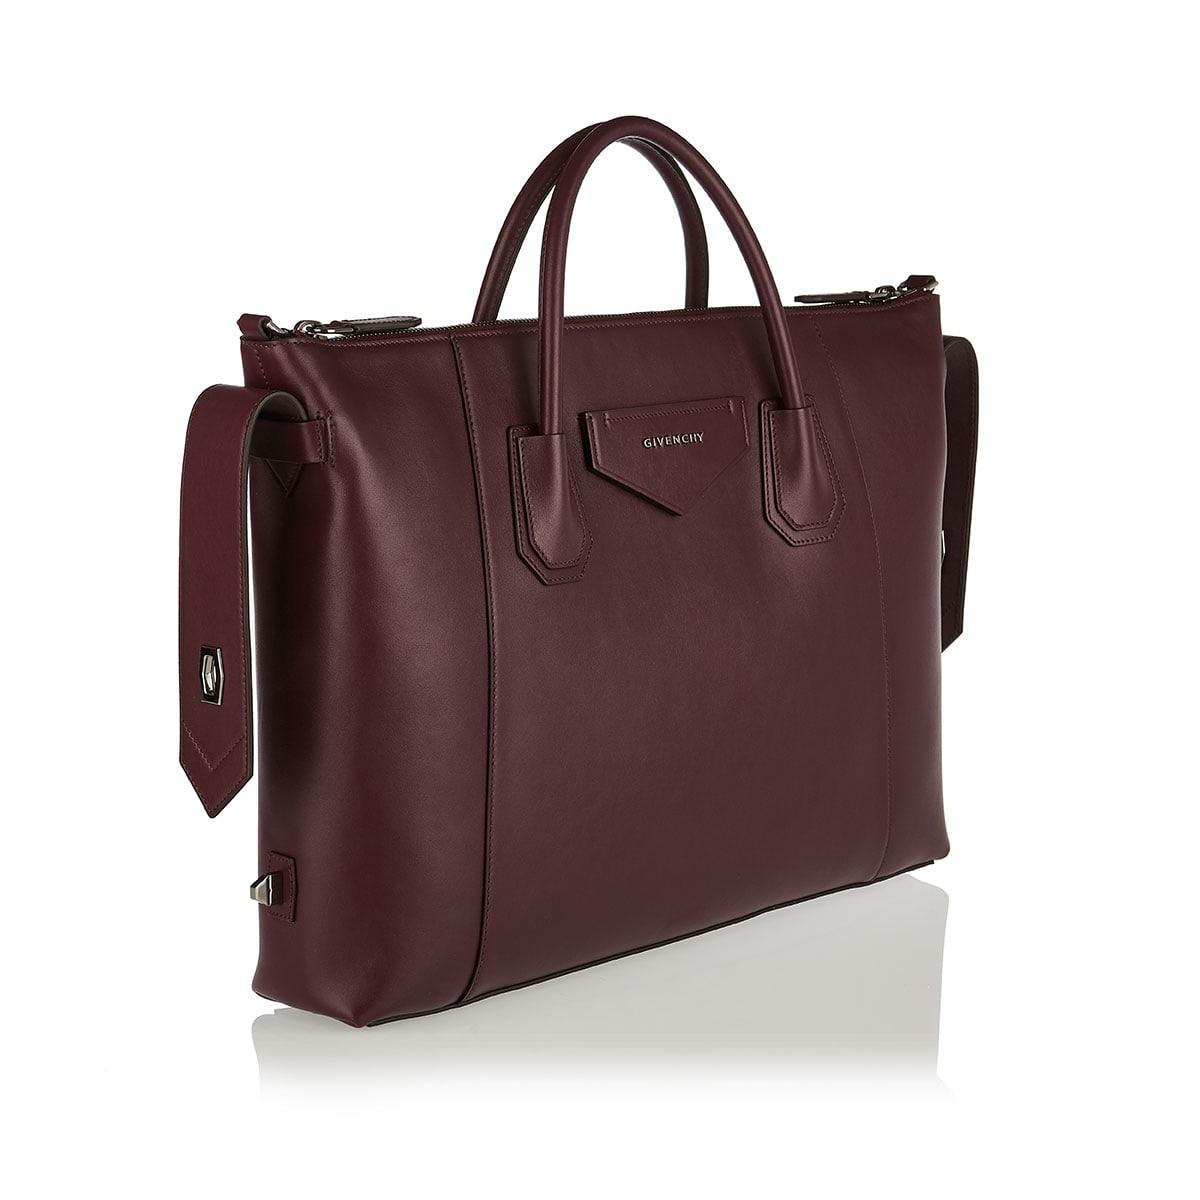 Antigona Soft medium leather tote